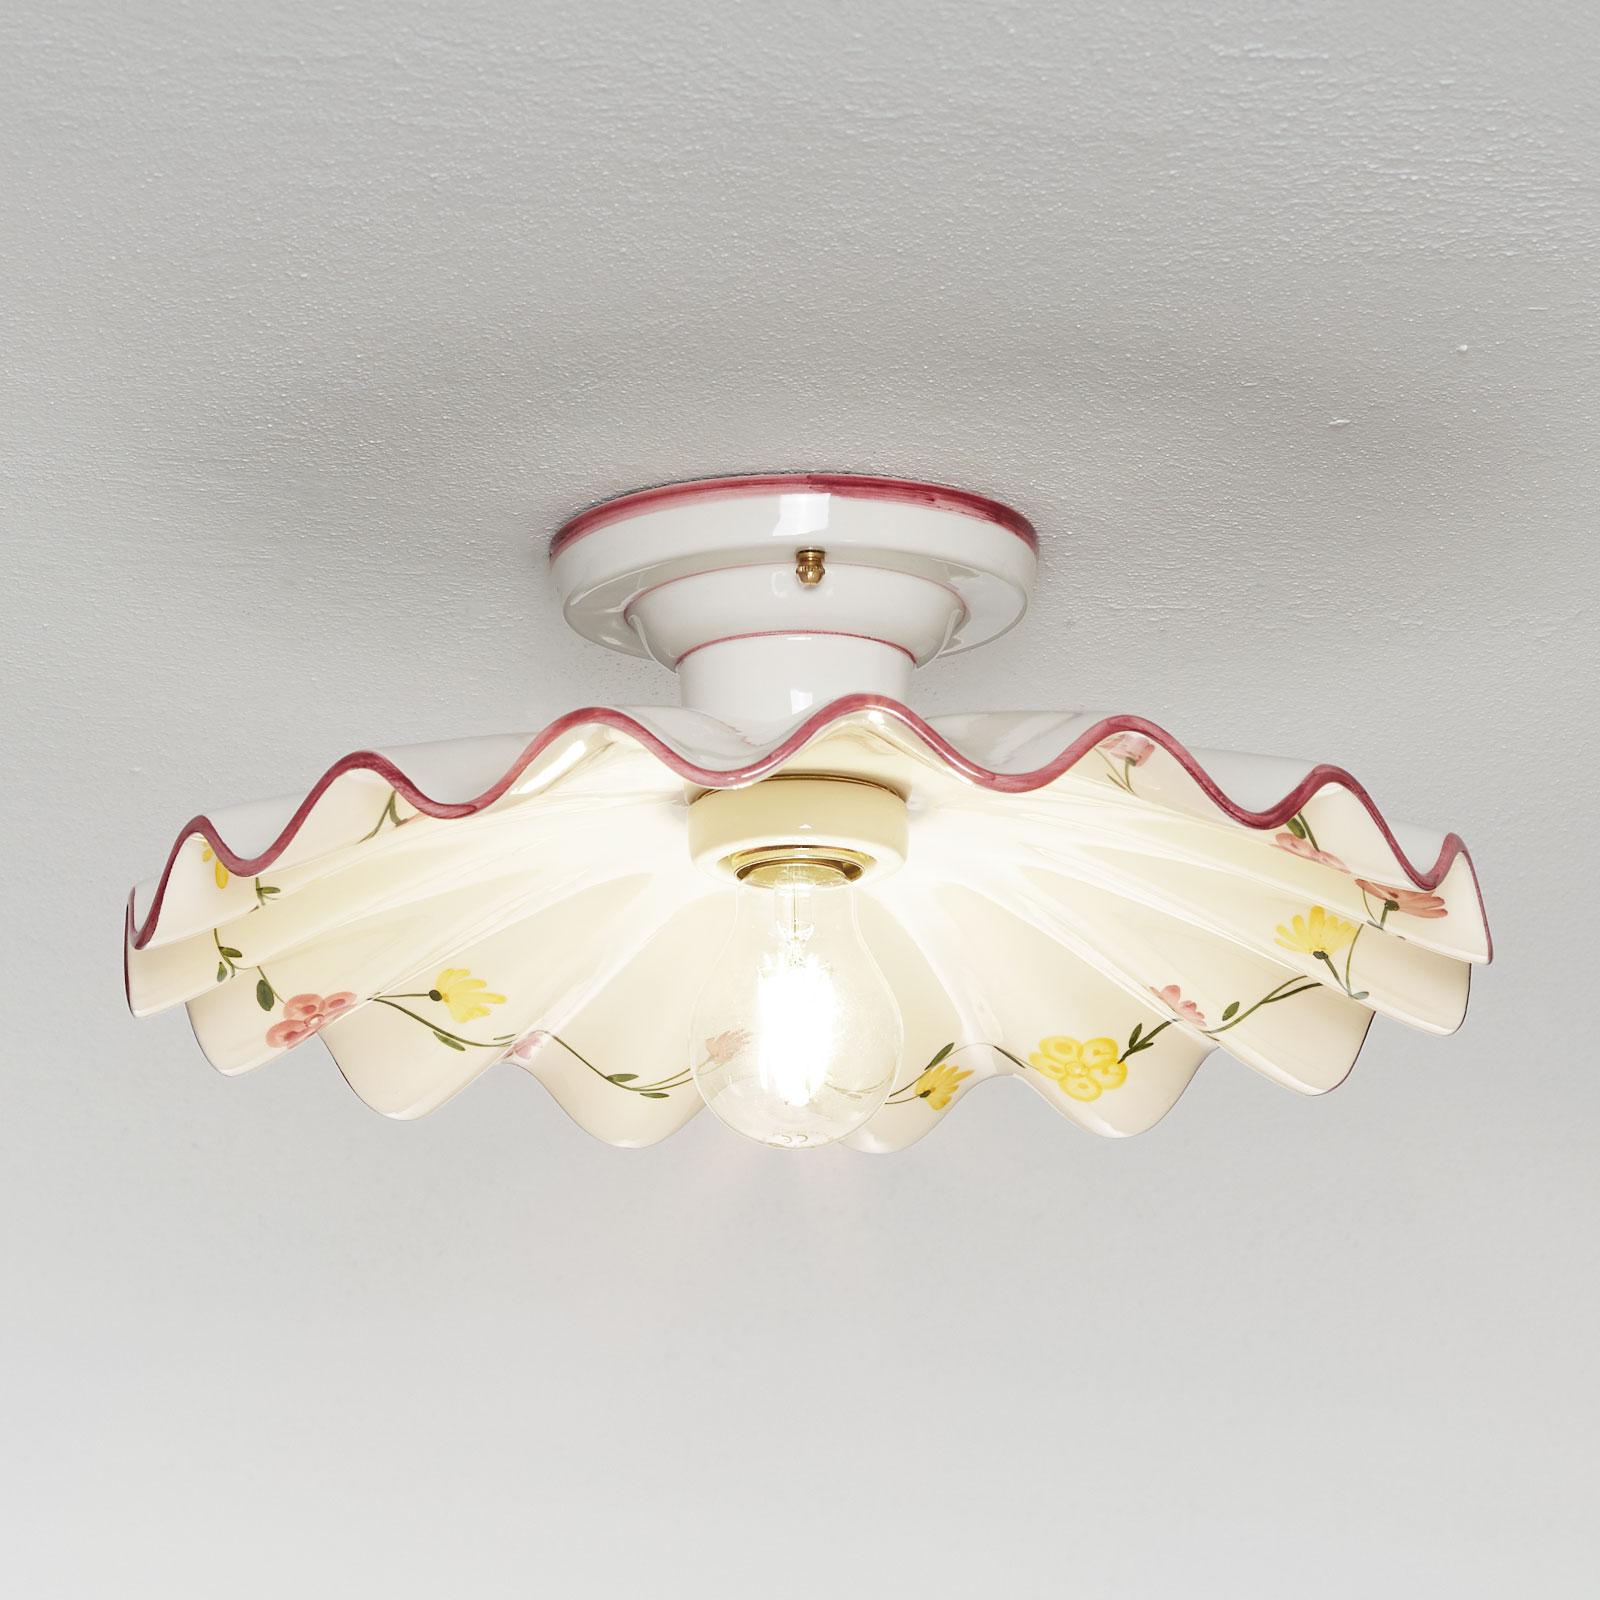 Lampa sufitowa AMETISTA z ceramiki, z odstępem